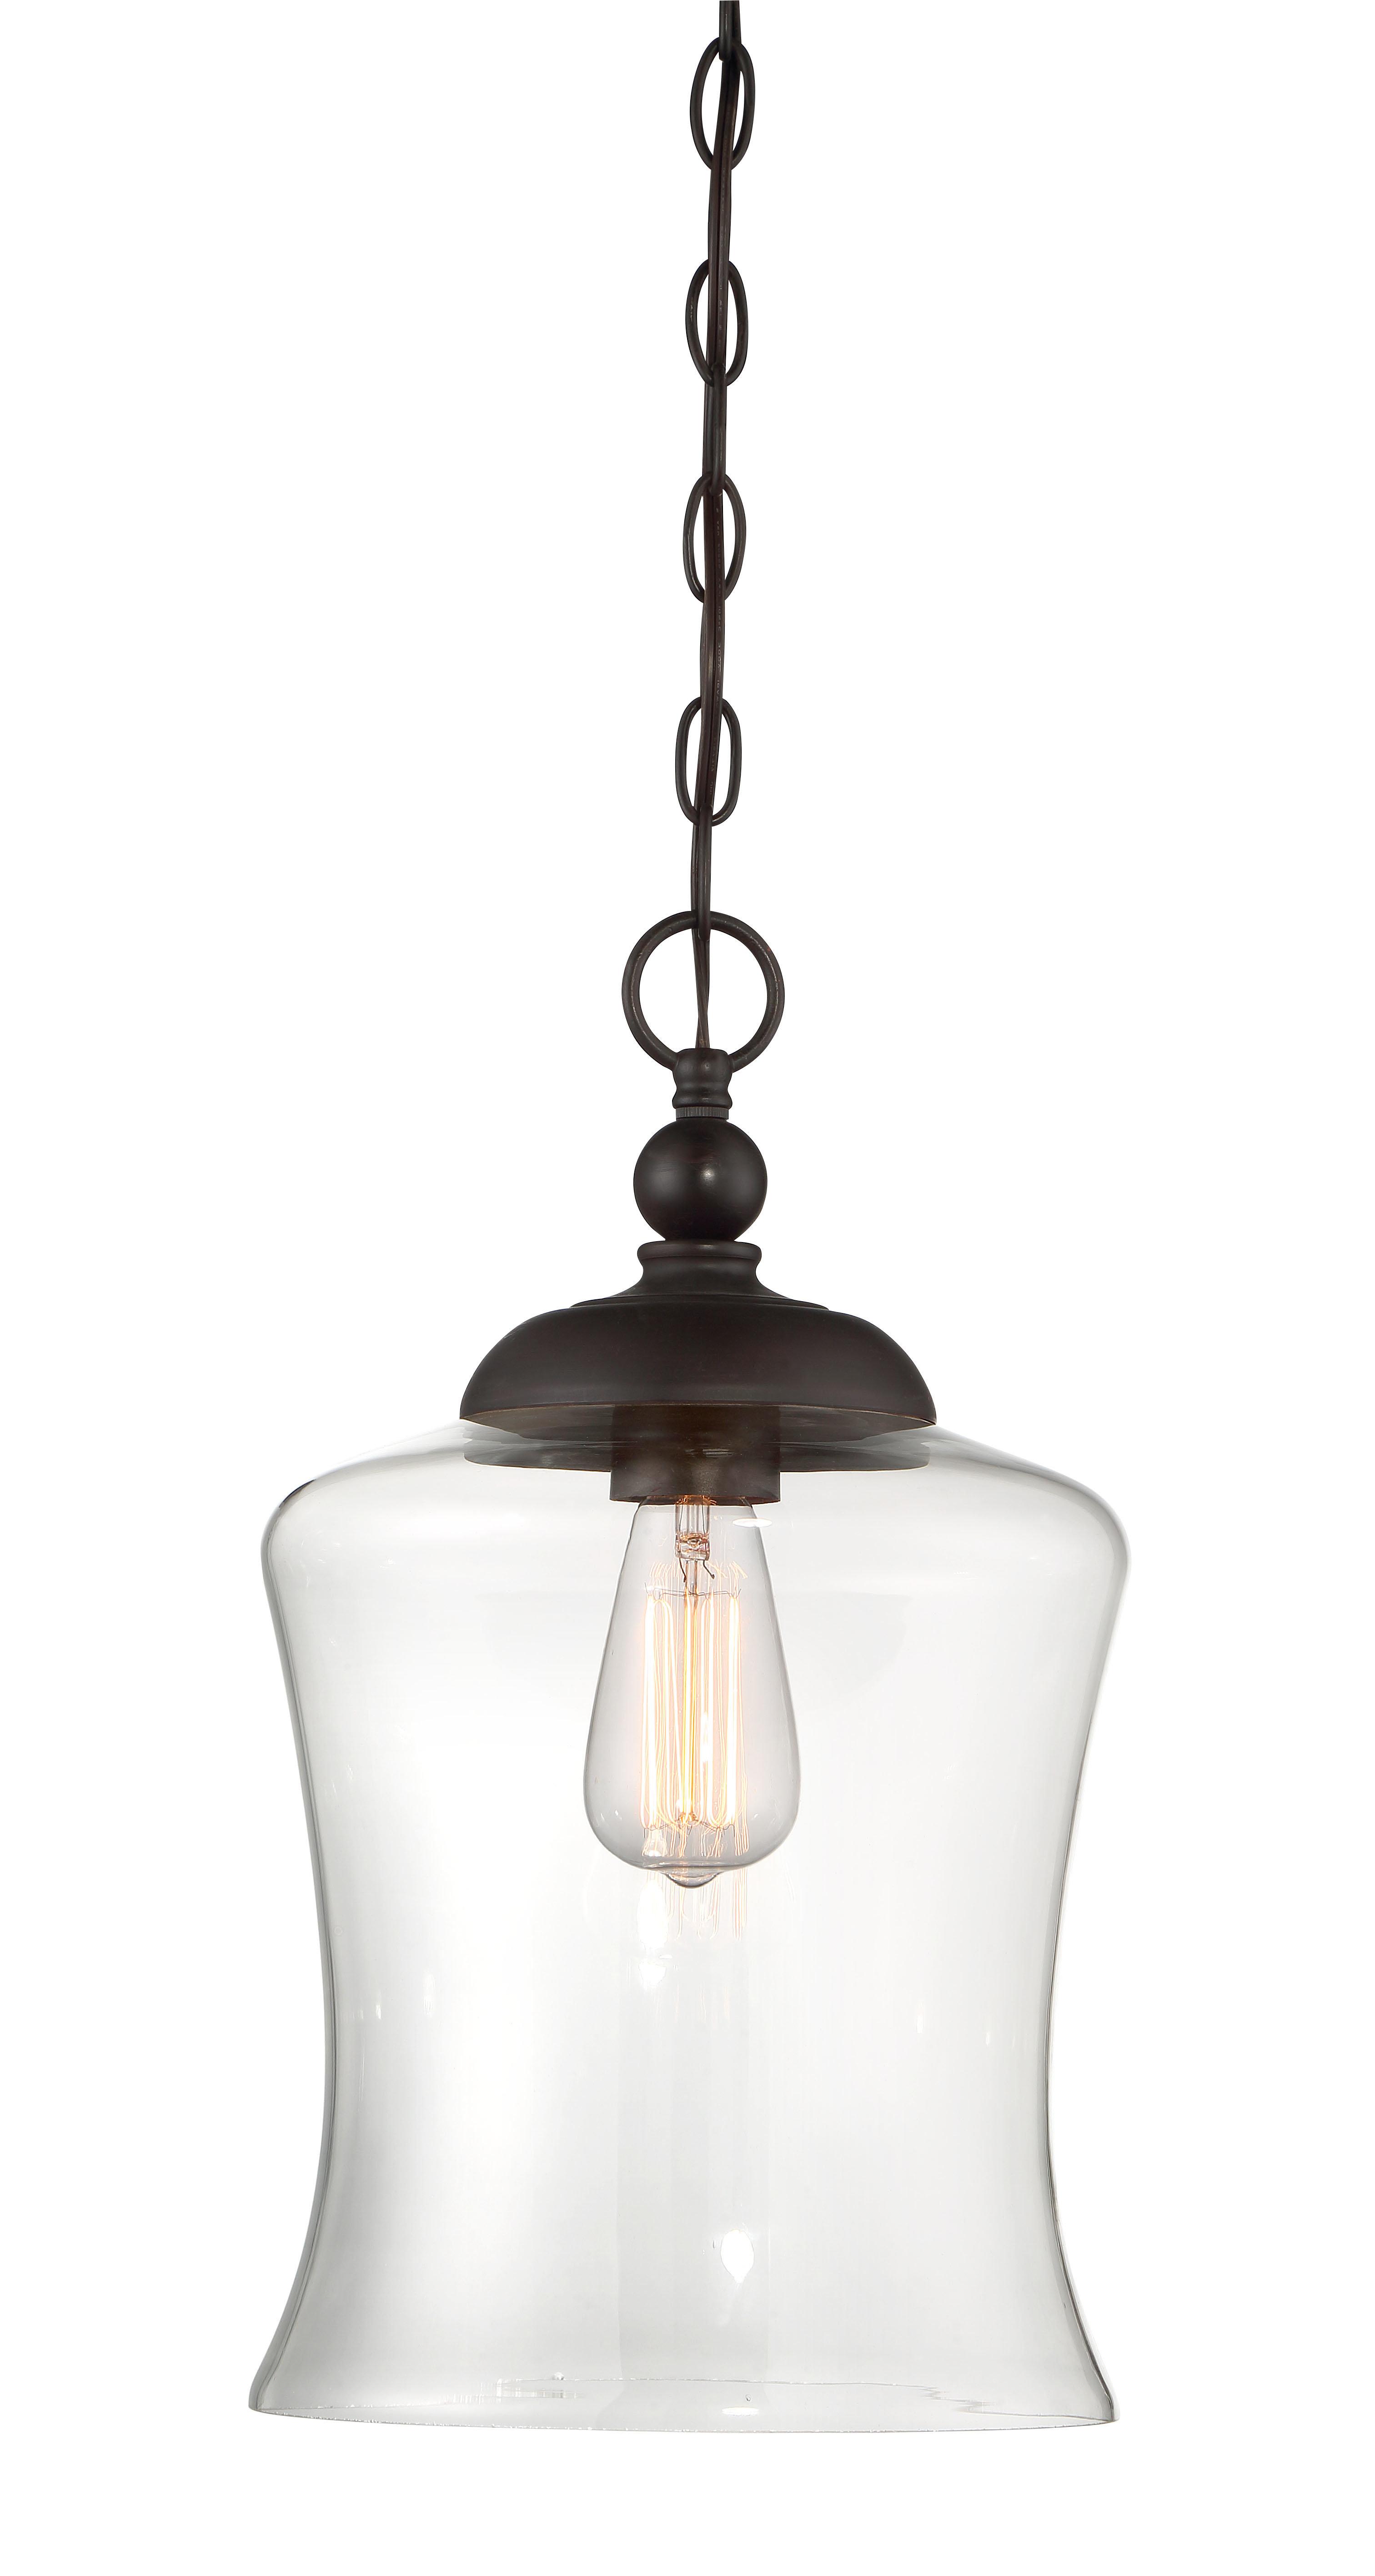 Van Horne 3 Light Single Teardrop Pendants Pertaining To Most Current Wentzville 1 Light Single Bell Pendant (Gallery 24 of 25)